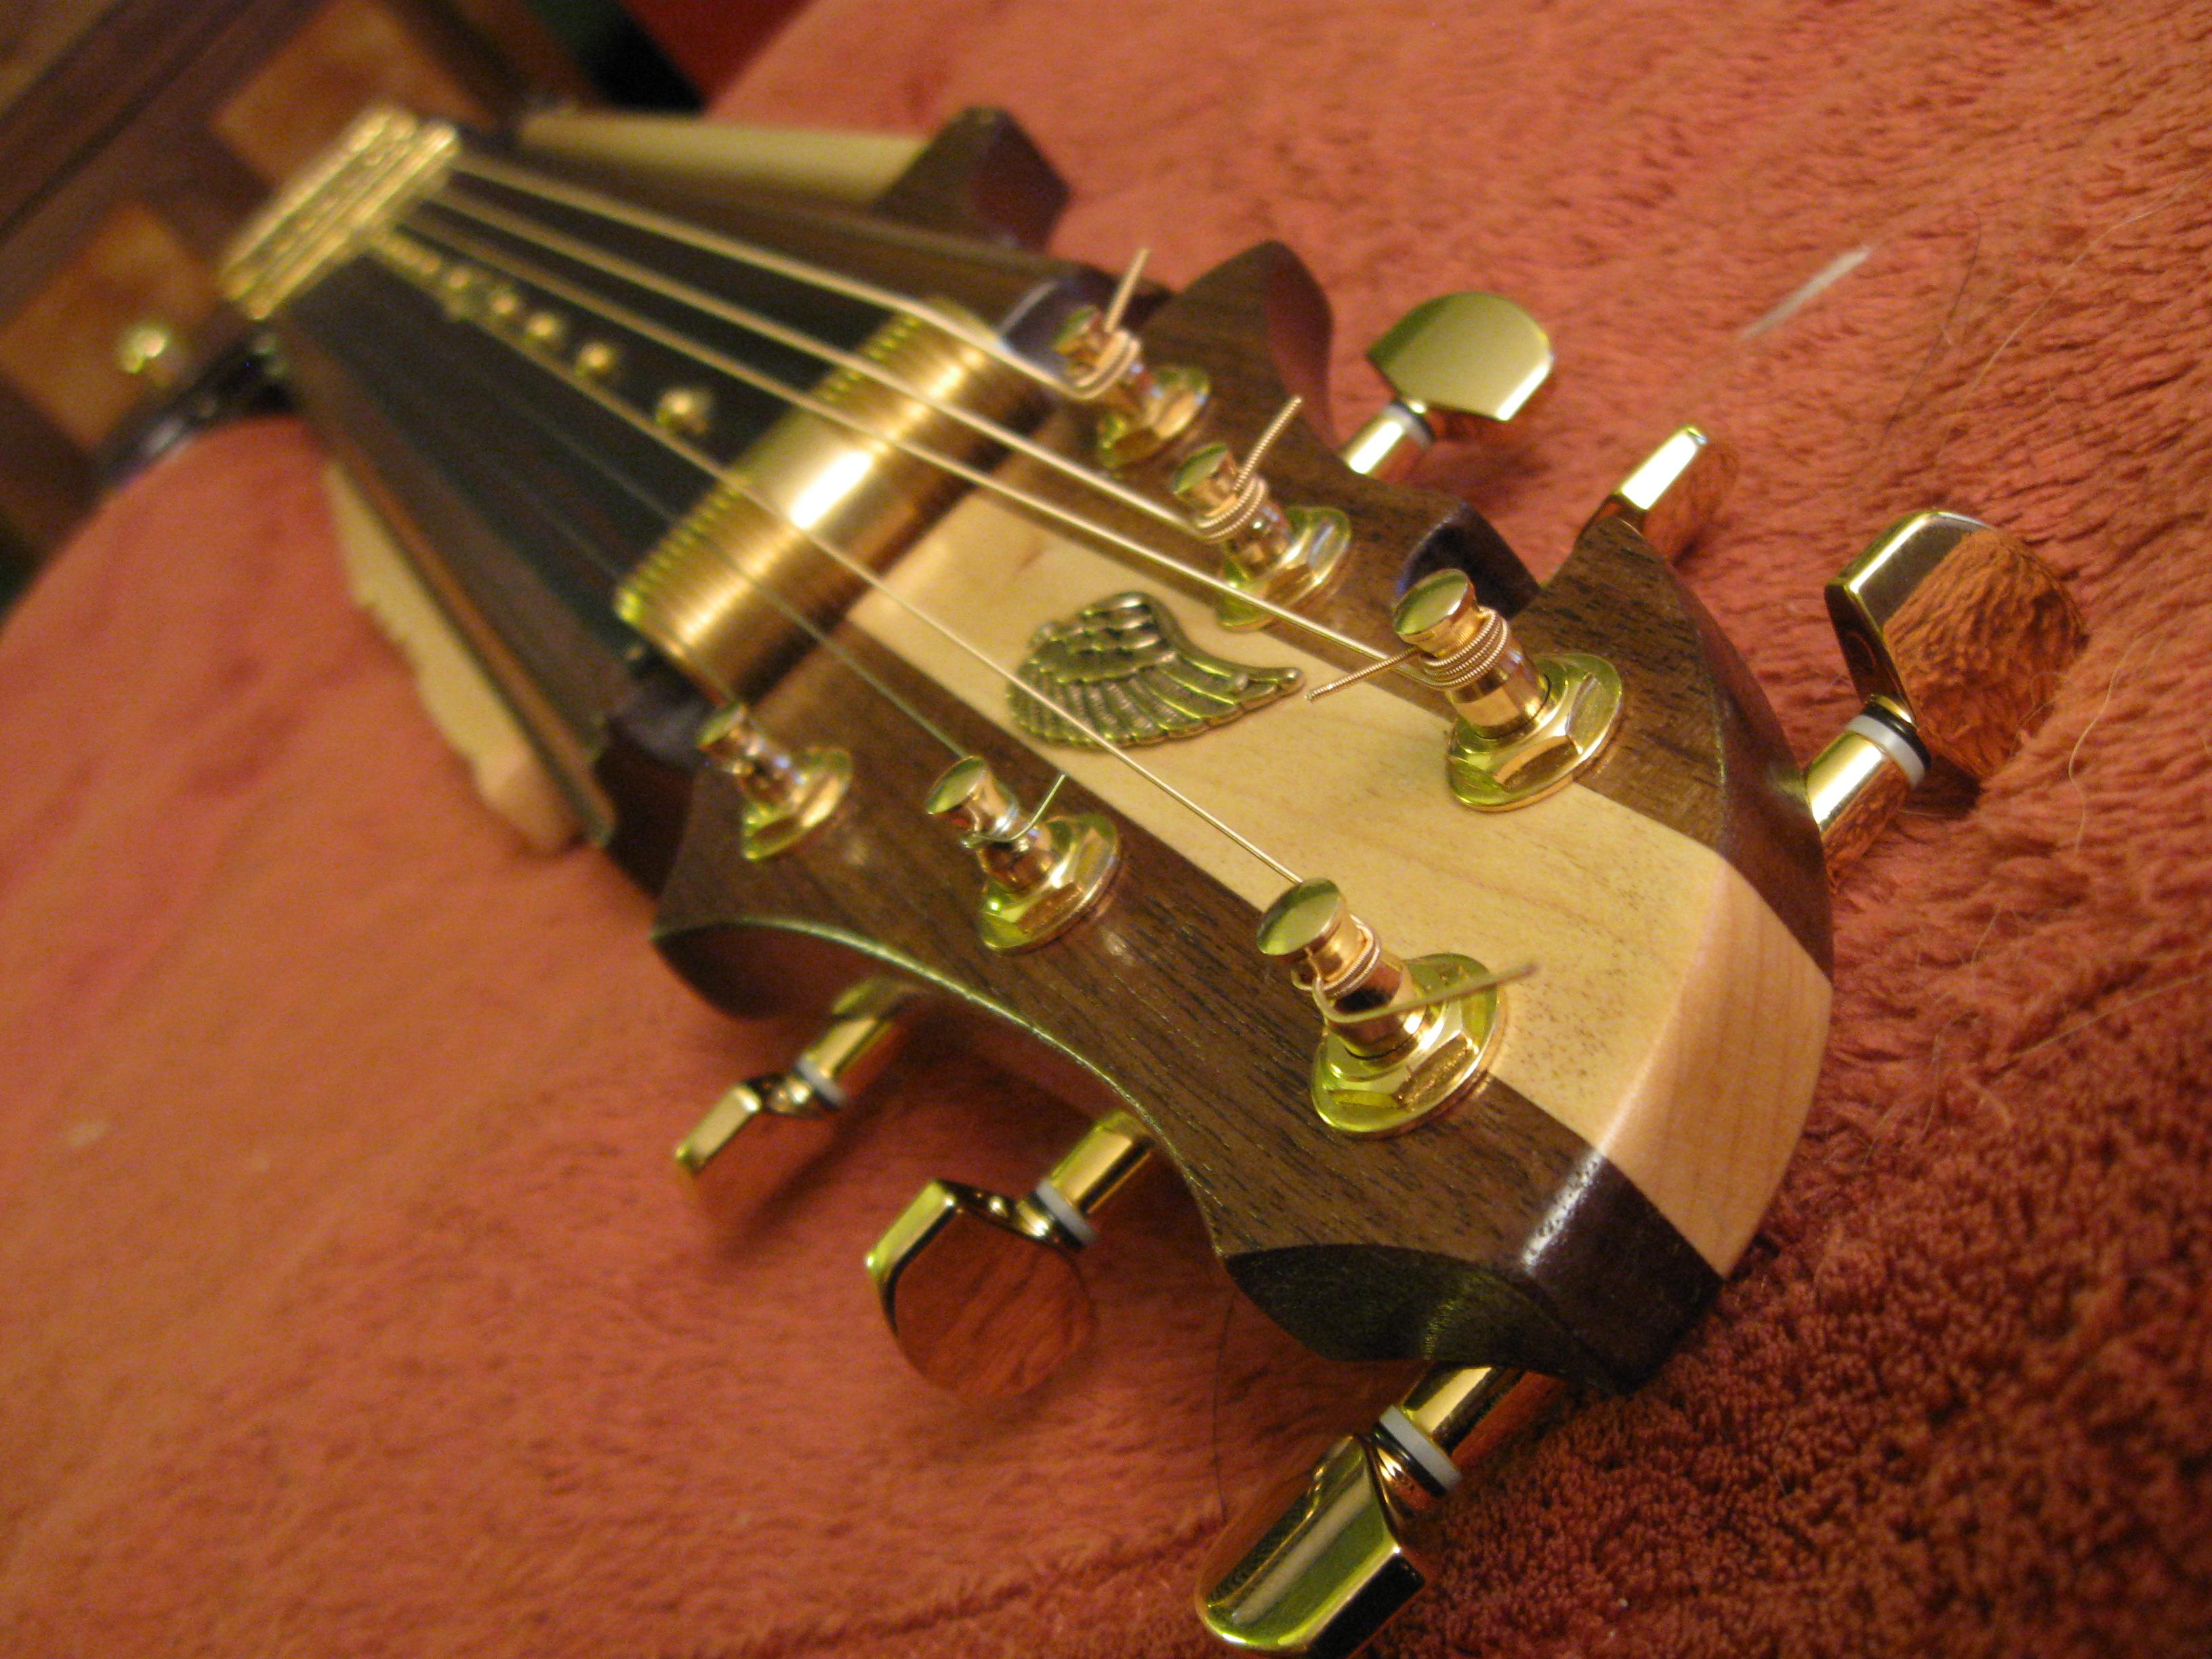 Kyle Miller's steampunk guitar